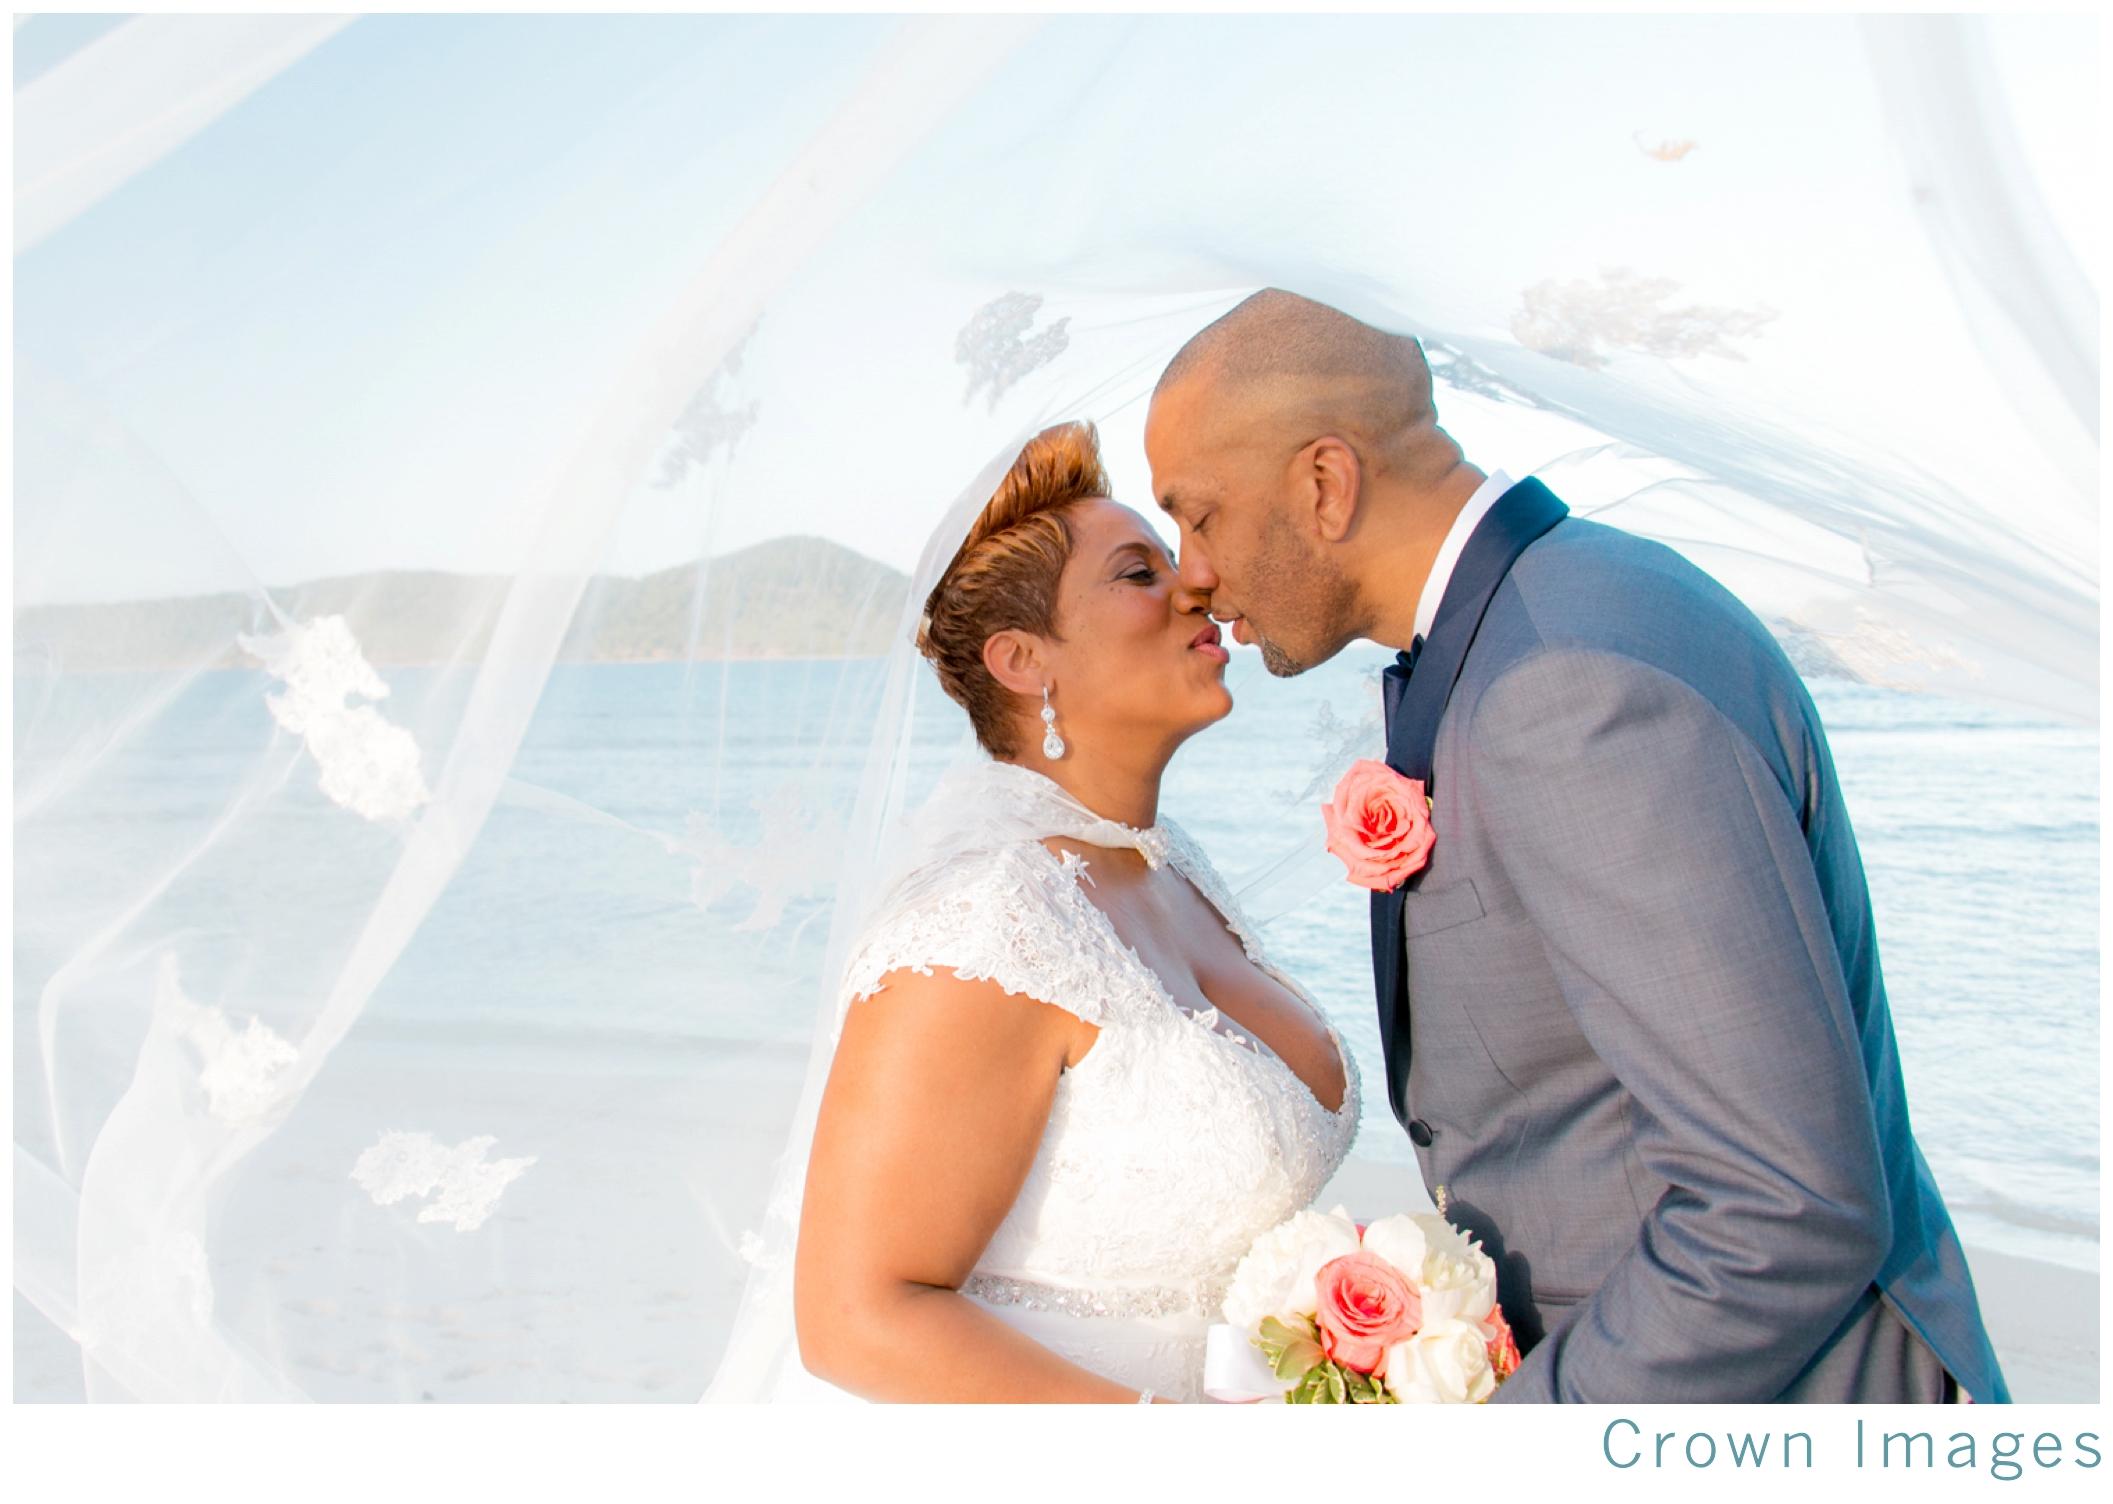 st-thomas-wedding-photographer_1083.jpg